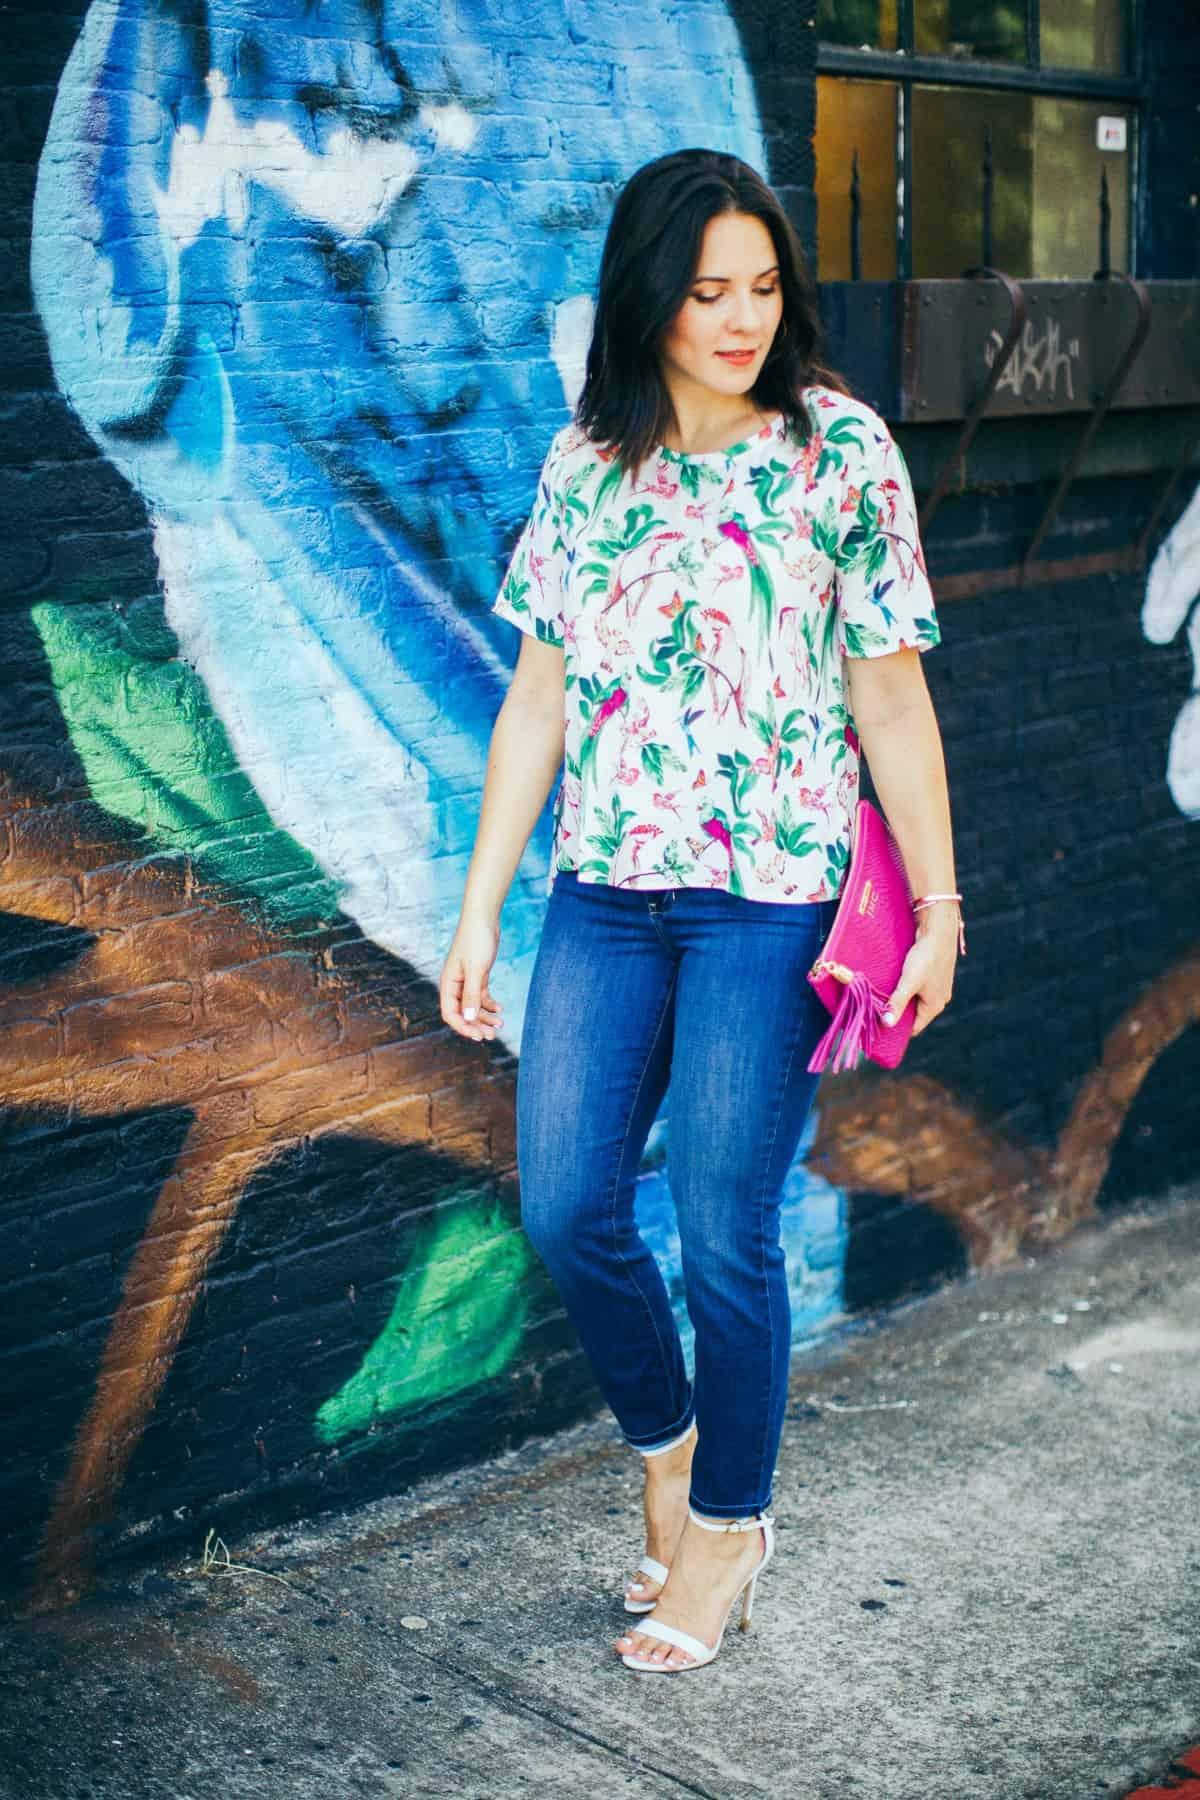 nydj cool embrace - summer date night outfit ideas - My Style Vita @mystylevita 15